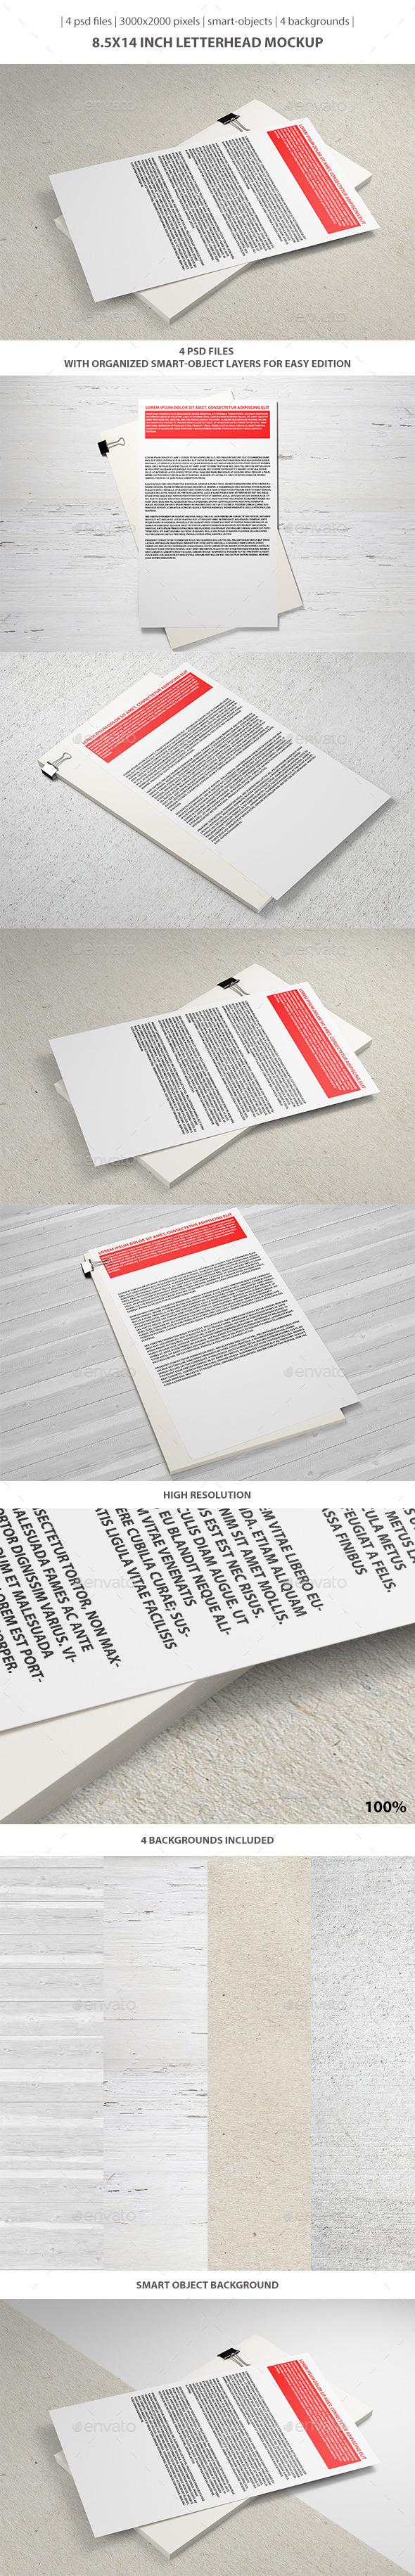 8.5x14 inch Letterhead Mockup - Stationery Print